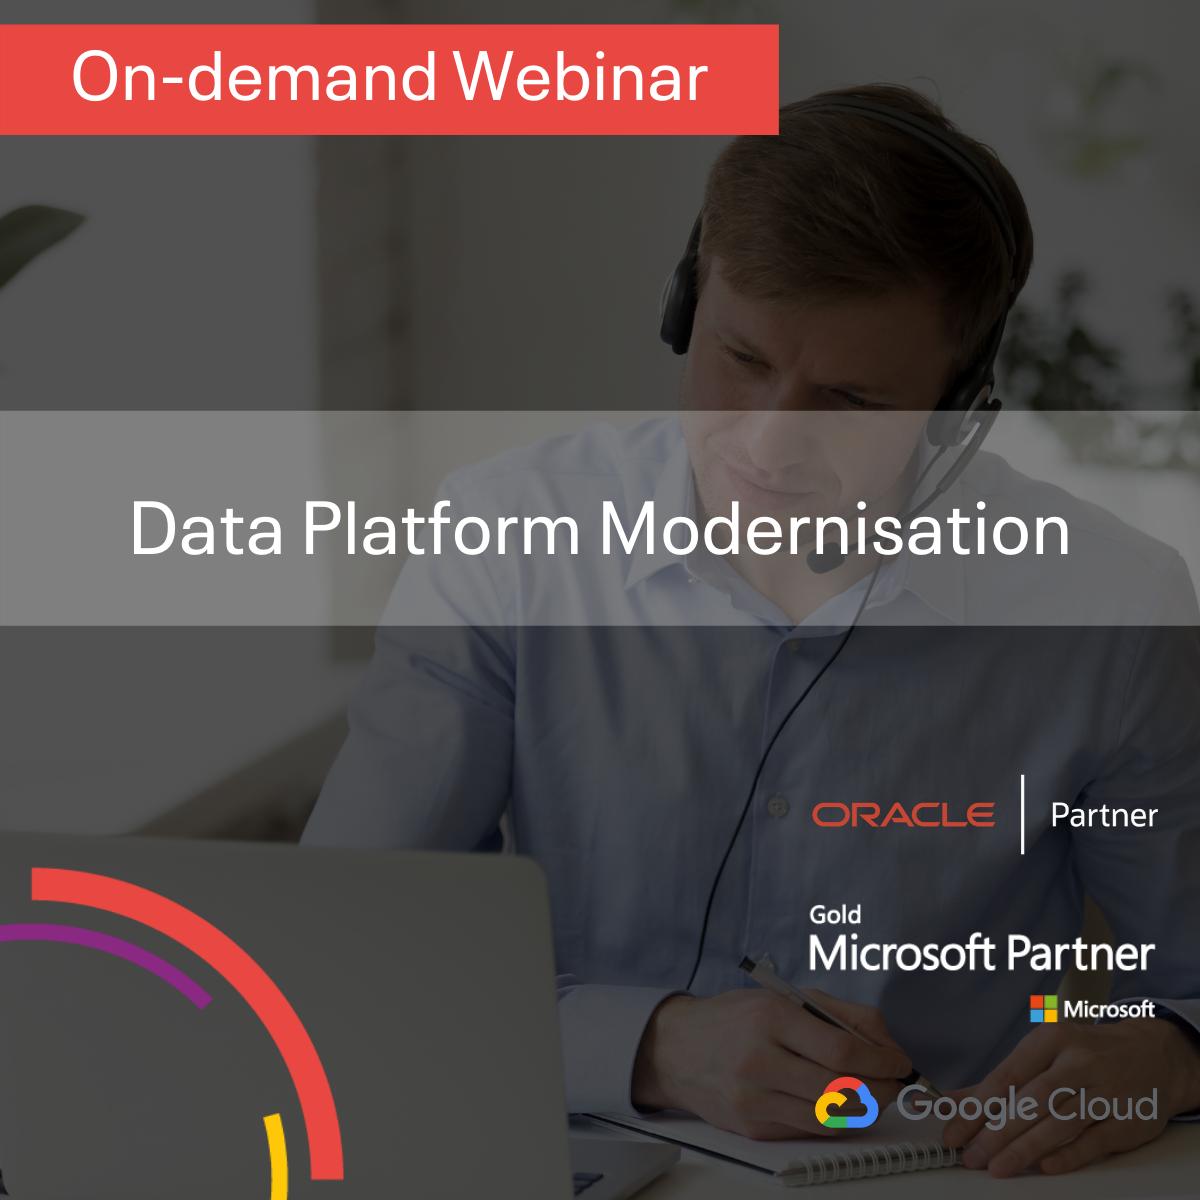 Data Platform Modernisation